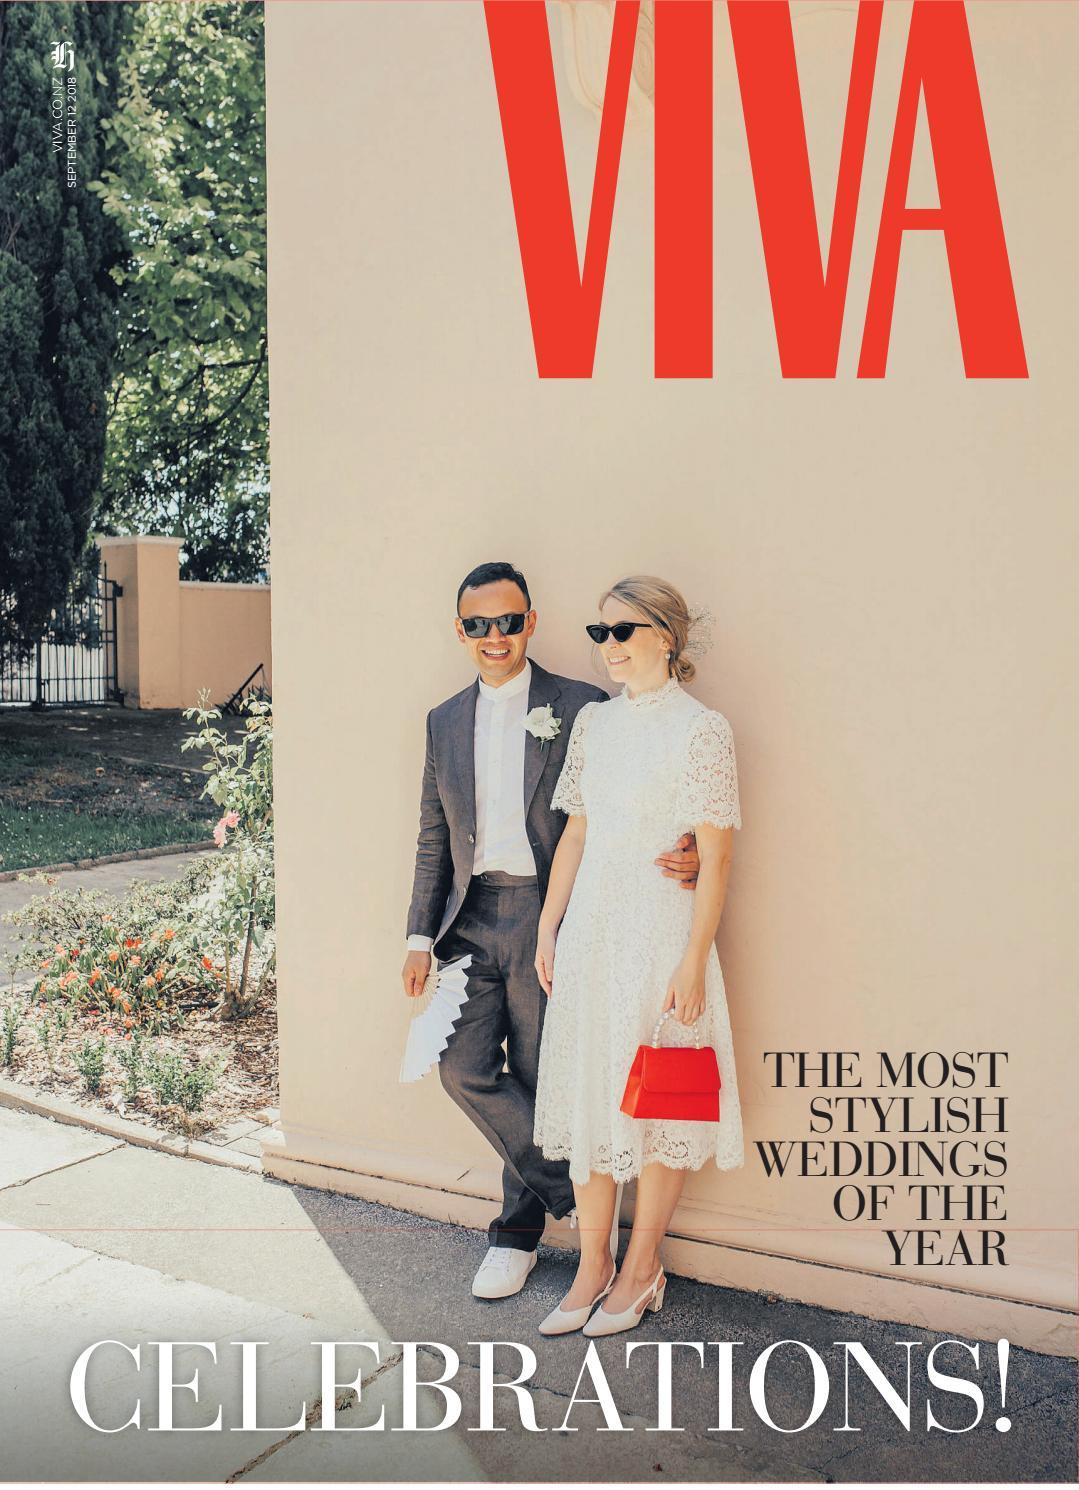 9d91928684ae31 NZH Viva WeddingIssue 12thSeptember2018 by NZME. - issuu